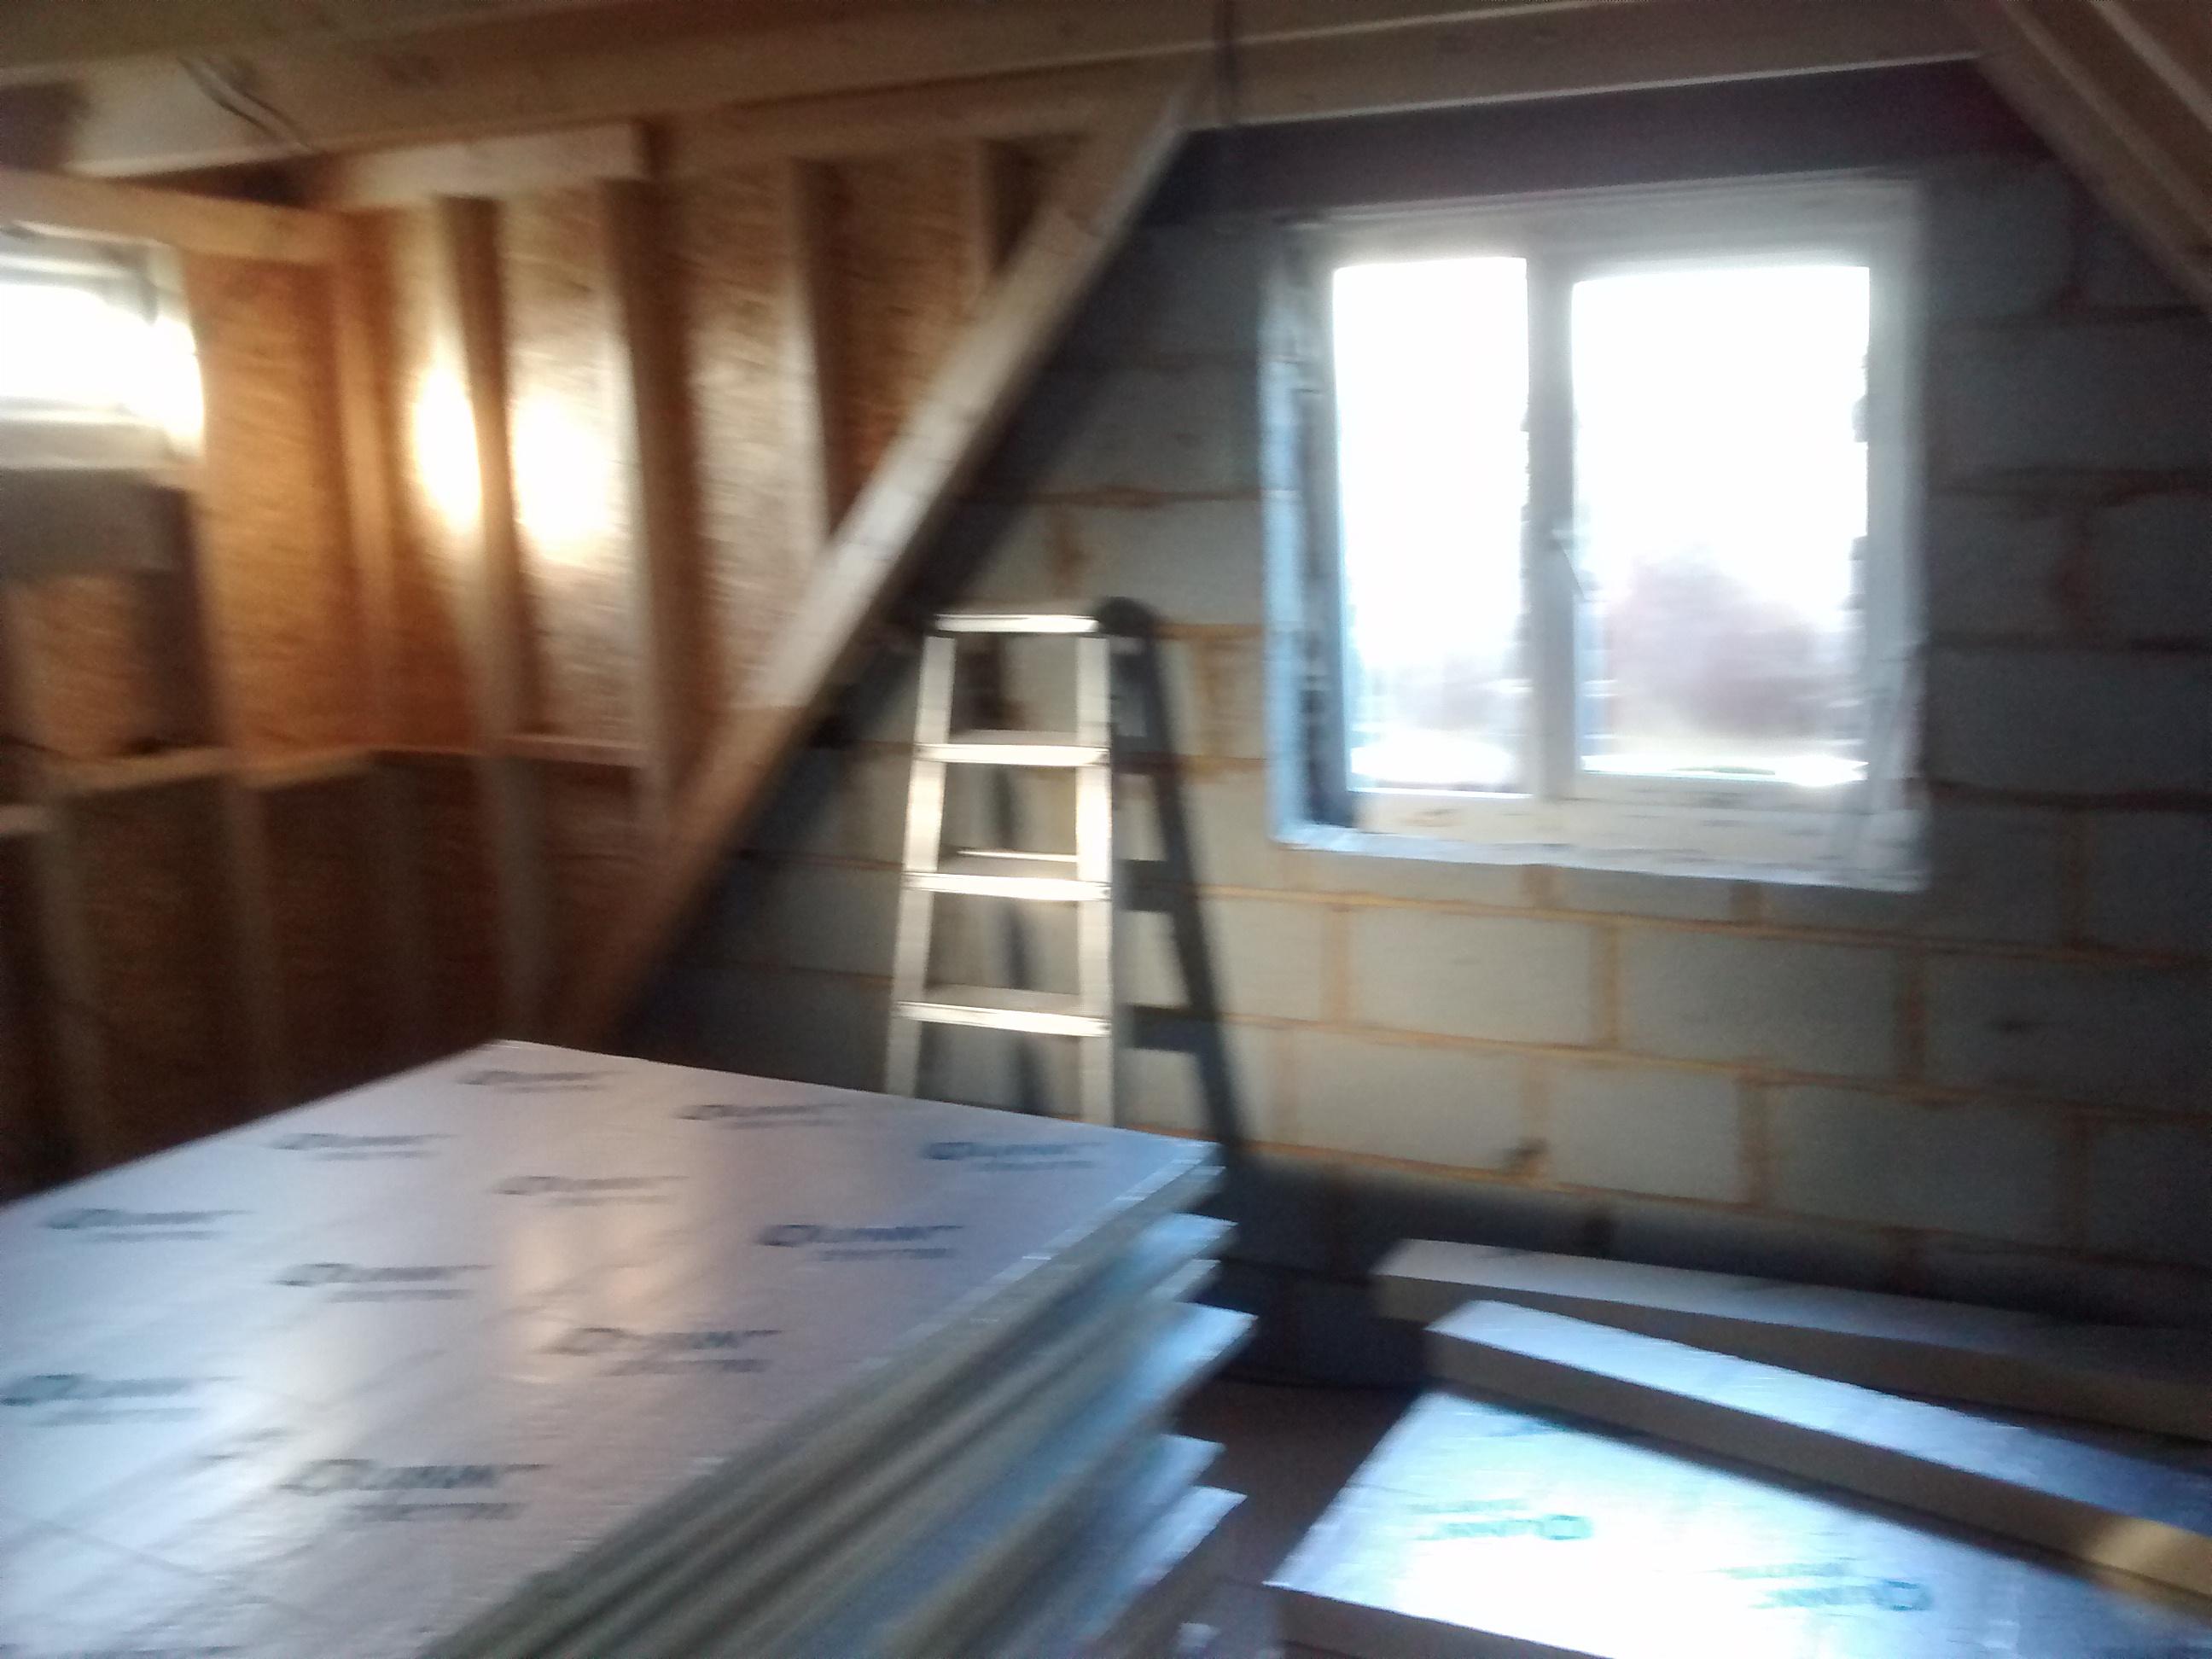 QuinnTherm insulation